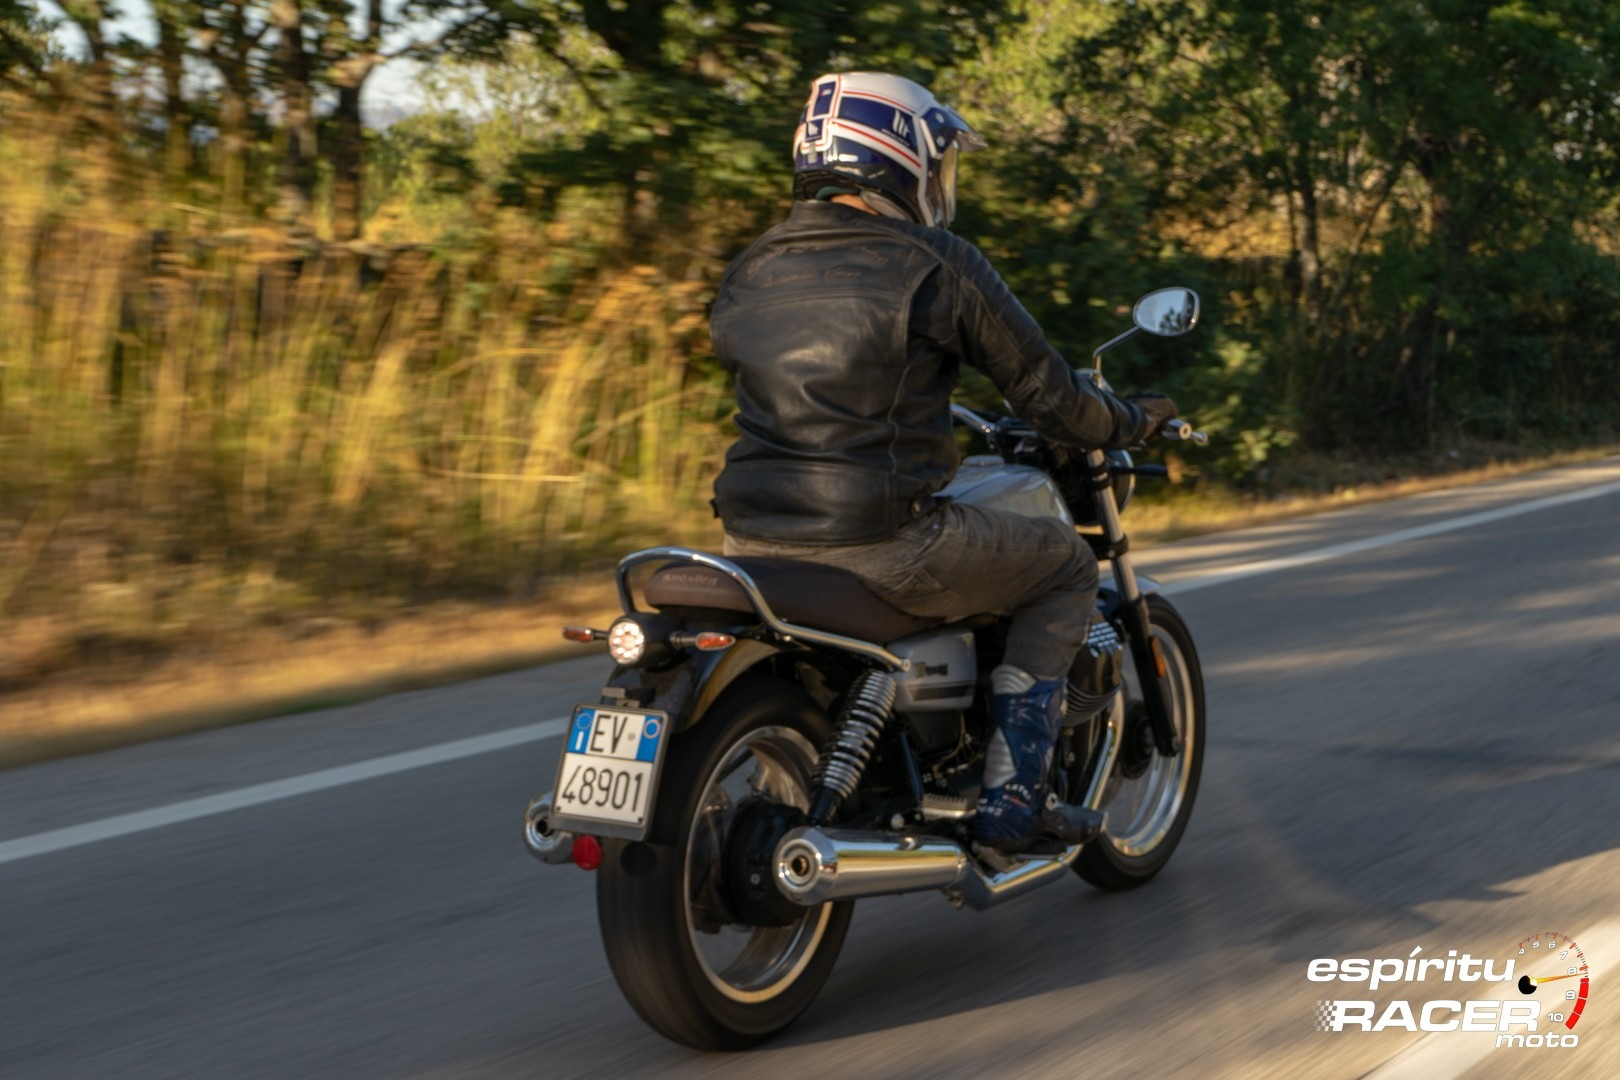 Moto Guzzi V7 850 Special 41